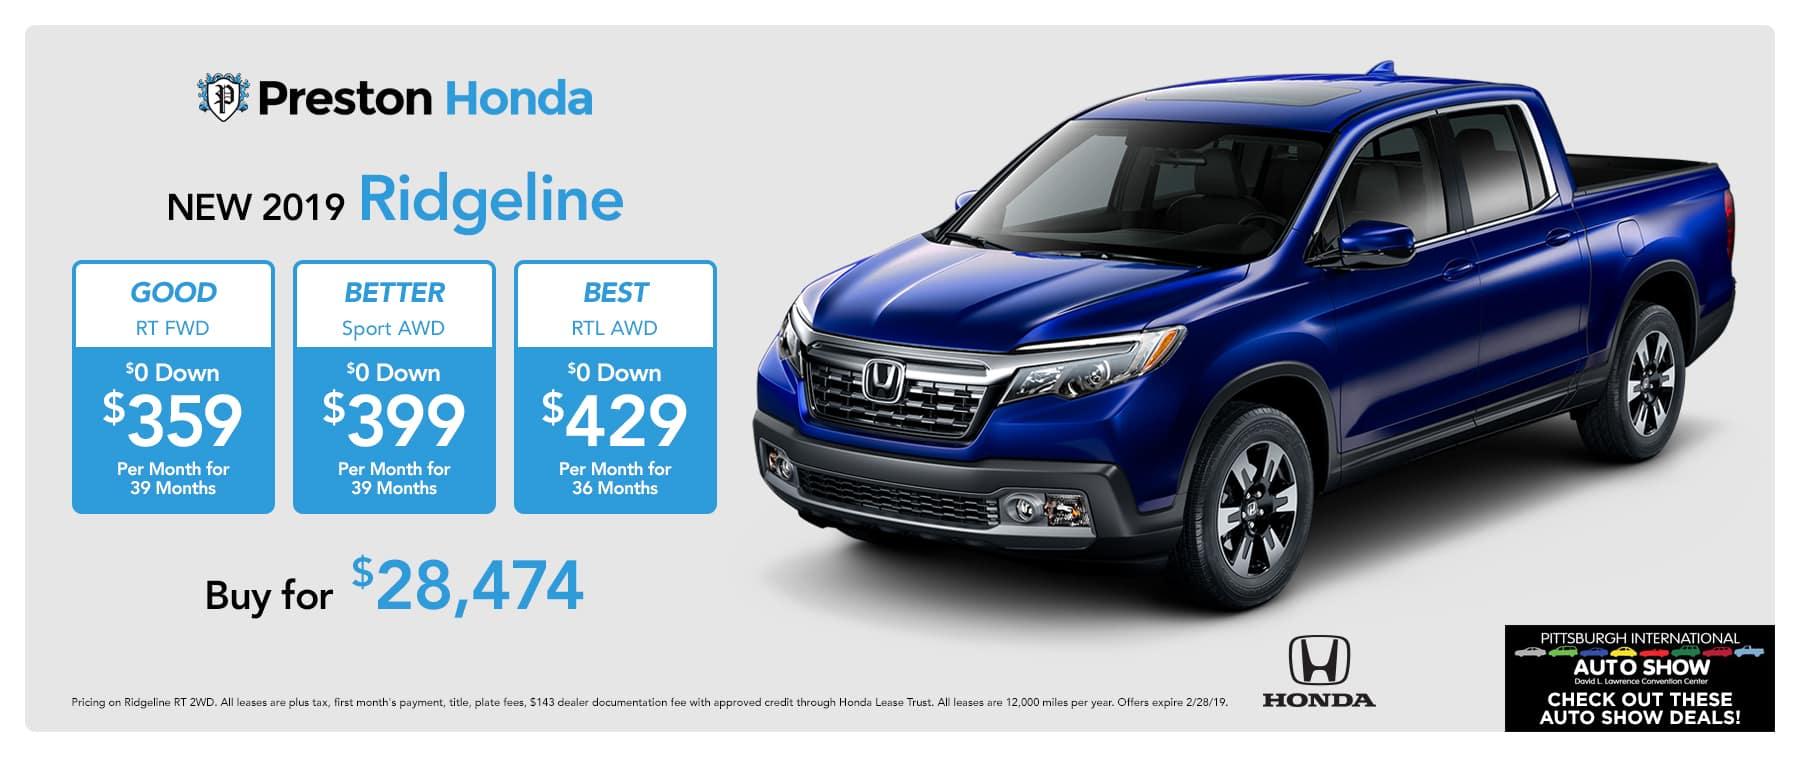 February Offers on the 2019 Honda Ridgeline